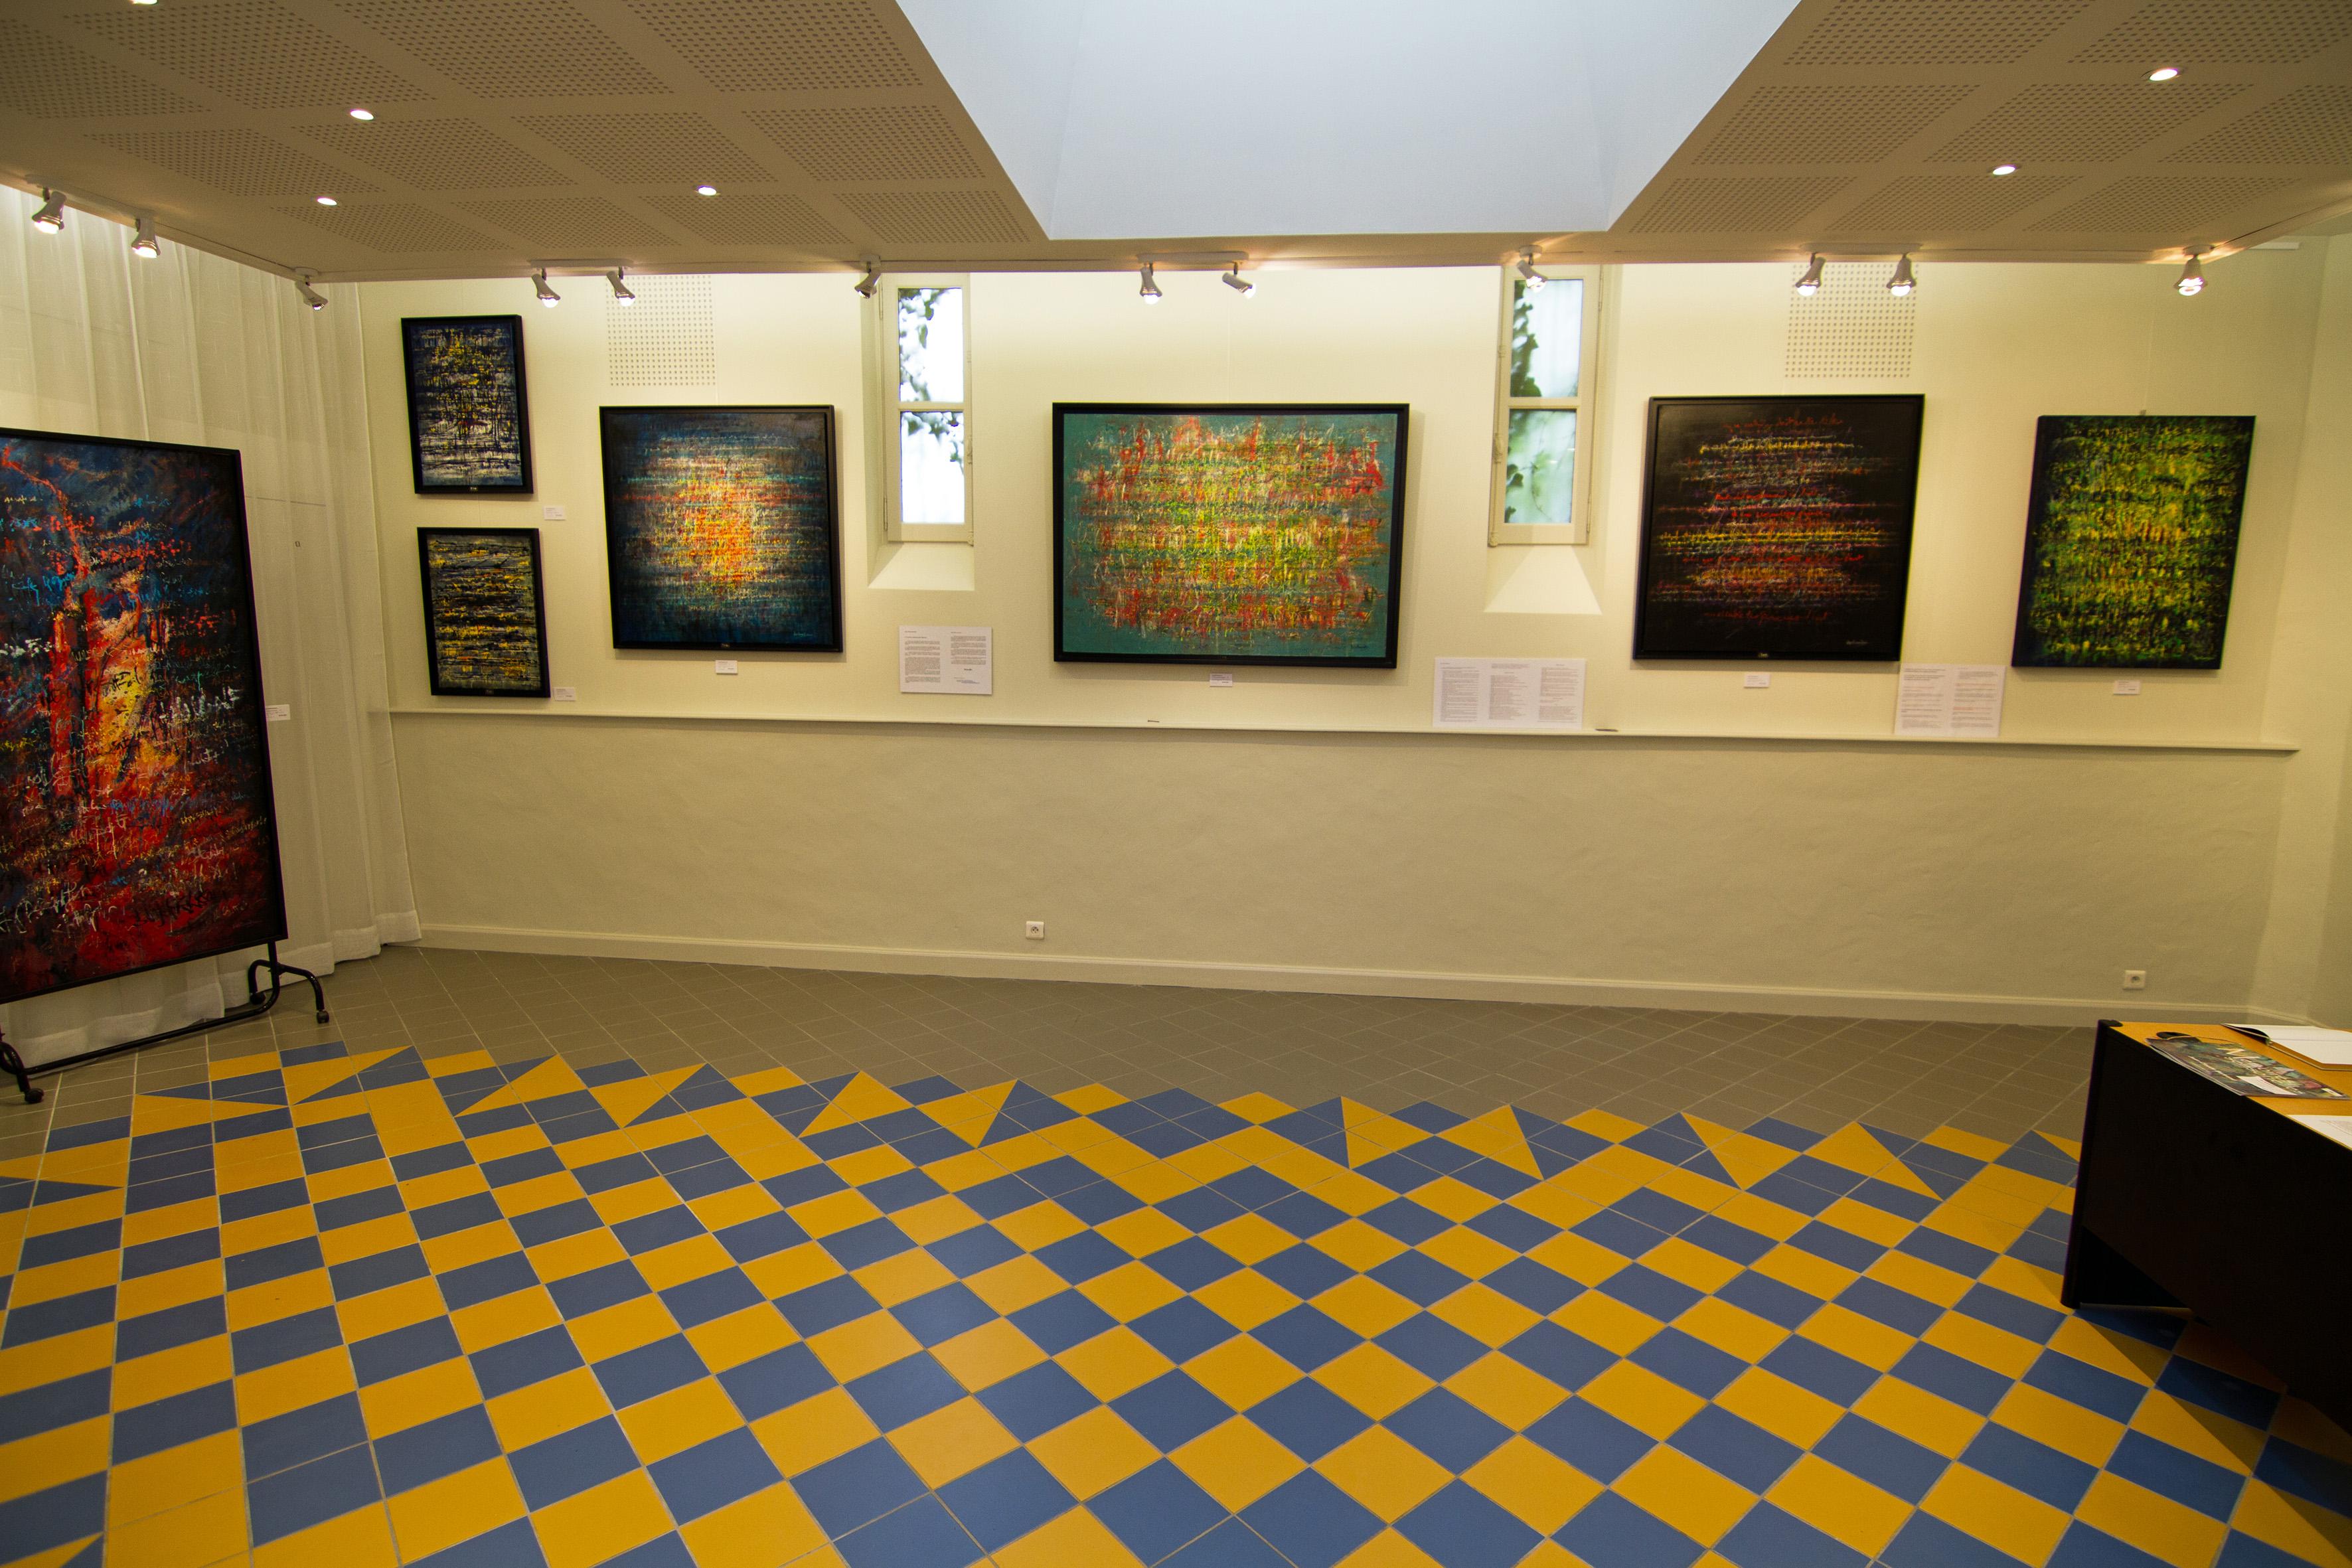 Galerie d'Art l'Arcade Saint-Clar_Jean-Claude Bertrand-5912-170707